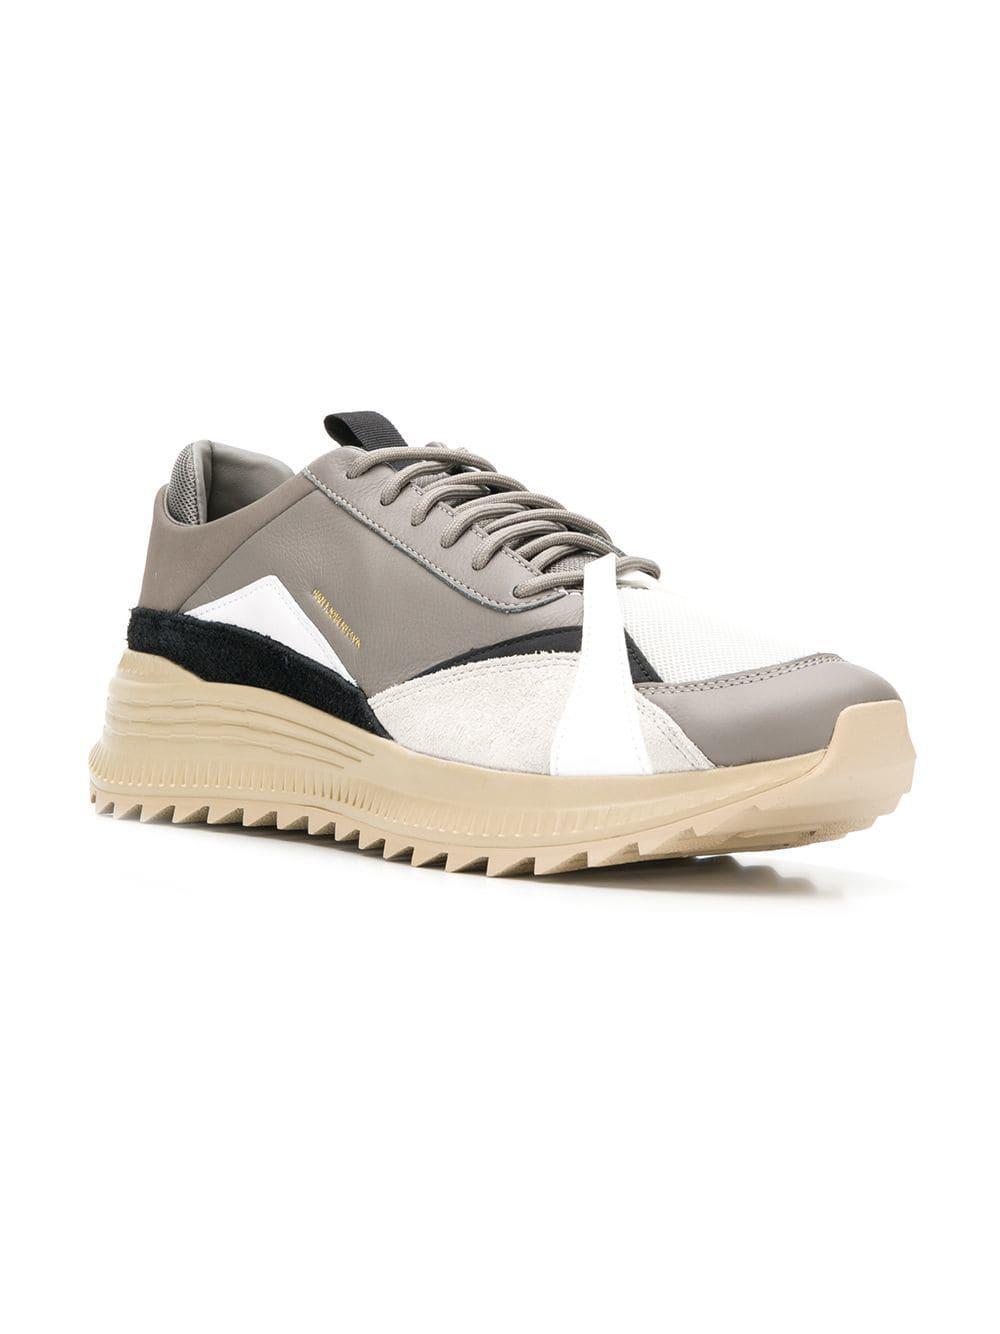 d5dd58ec3d48c9 PUMA X Han Kjøbenhavn Avid Sneakers in Gray for Men - Lyst